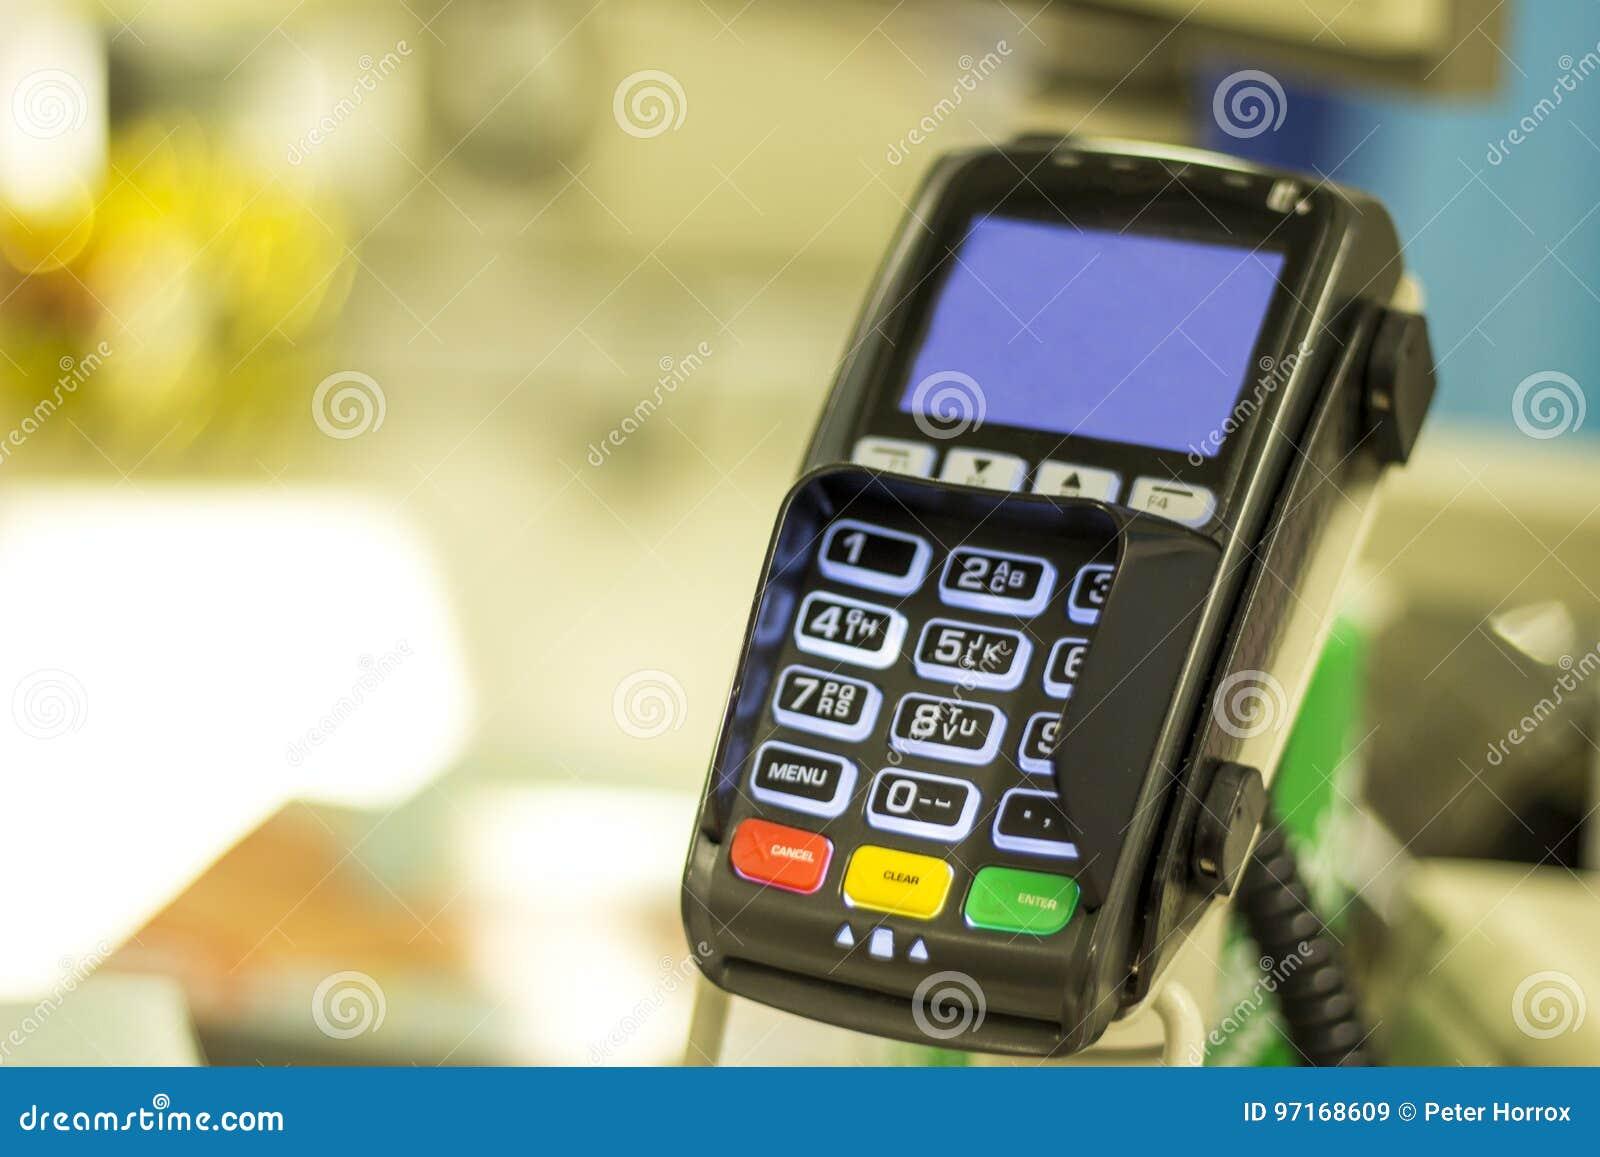 Retail card reader